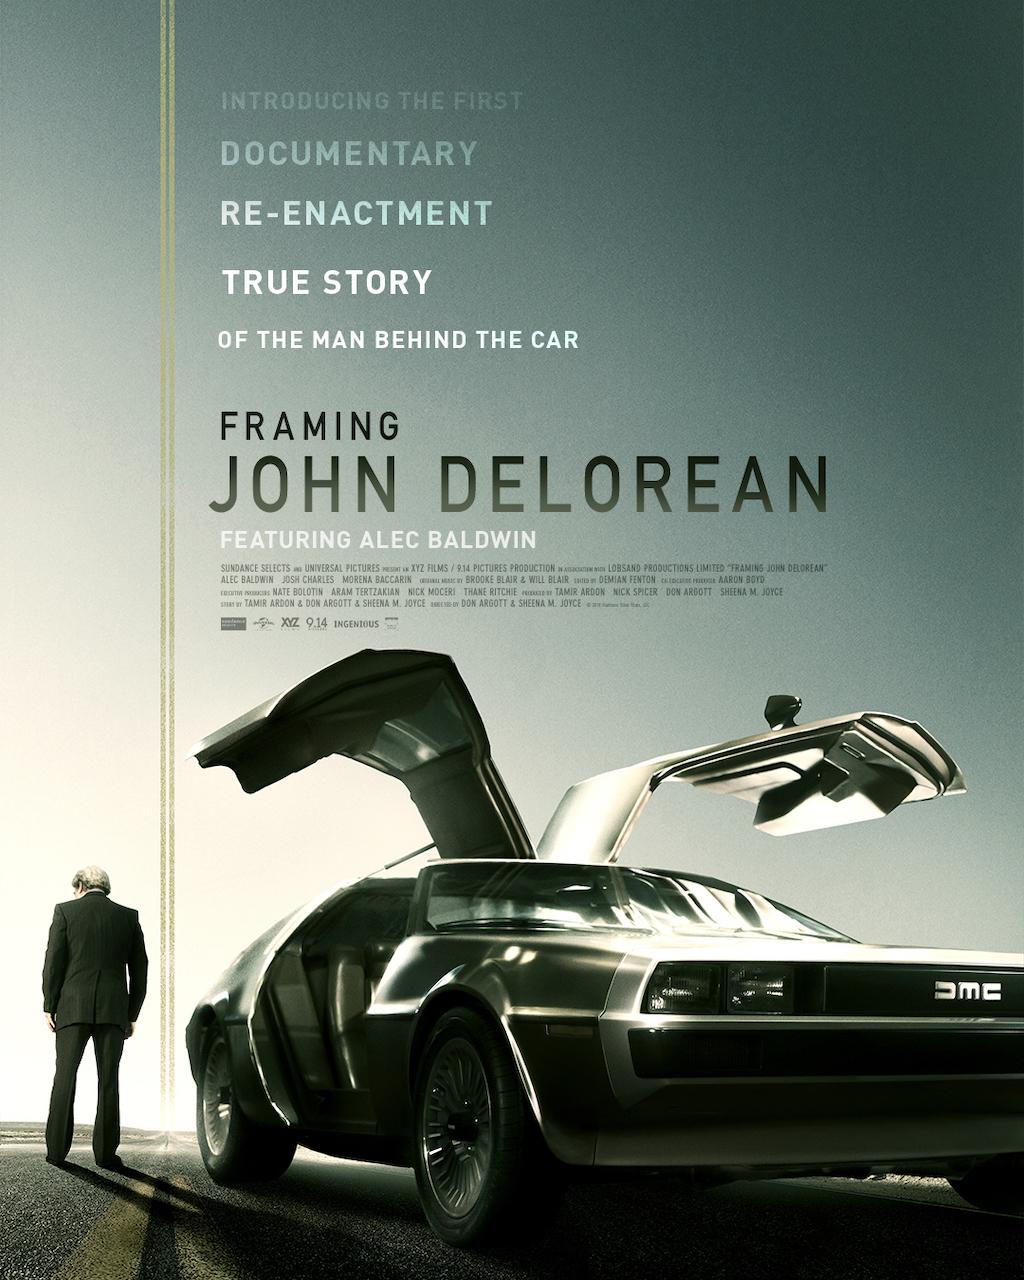 Framing John DeLorean – Exclusive interview with Tamir Ardon